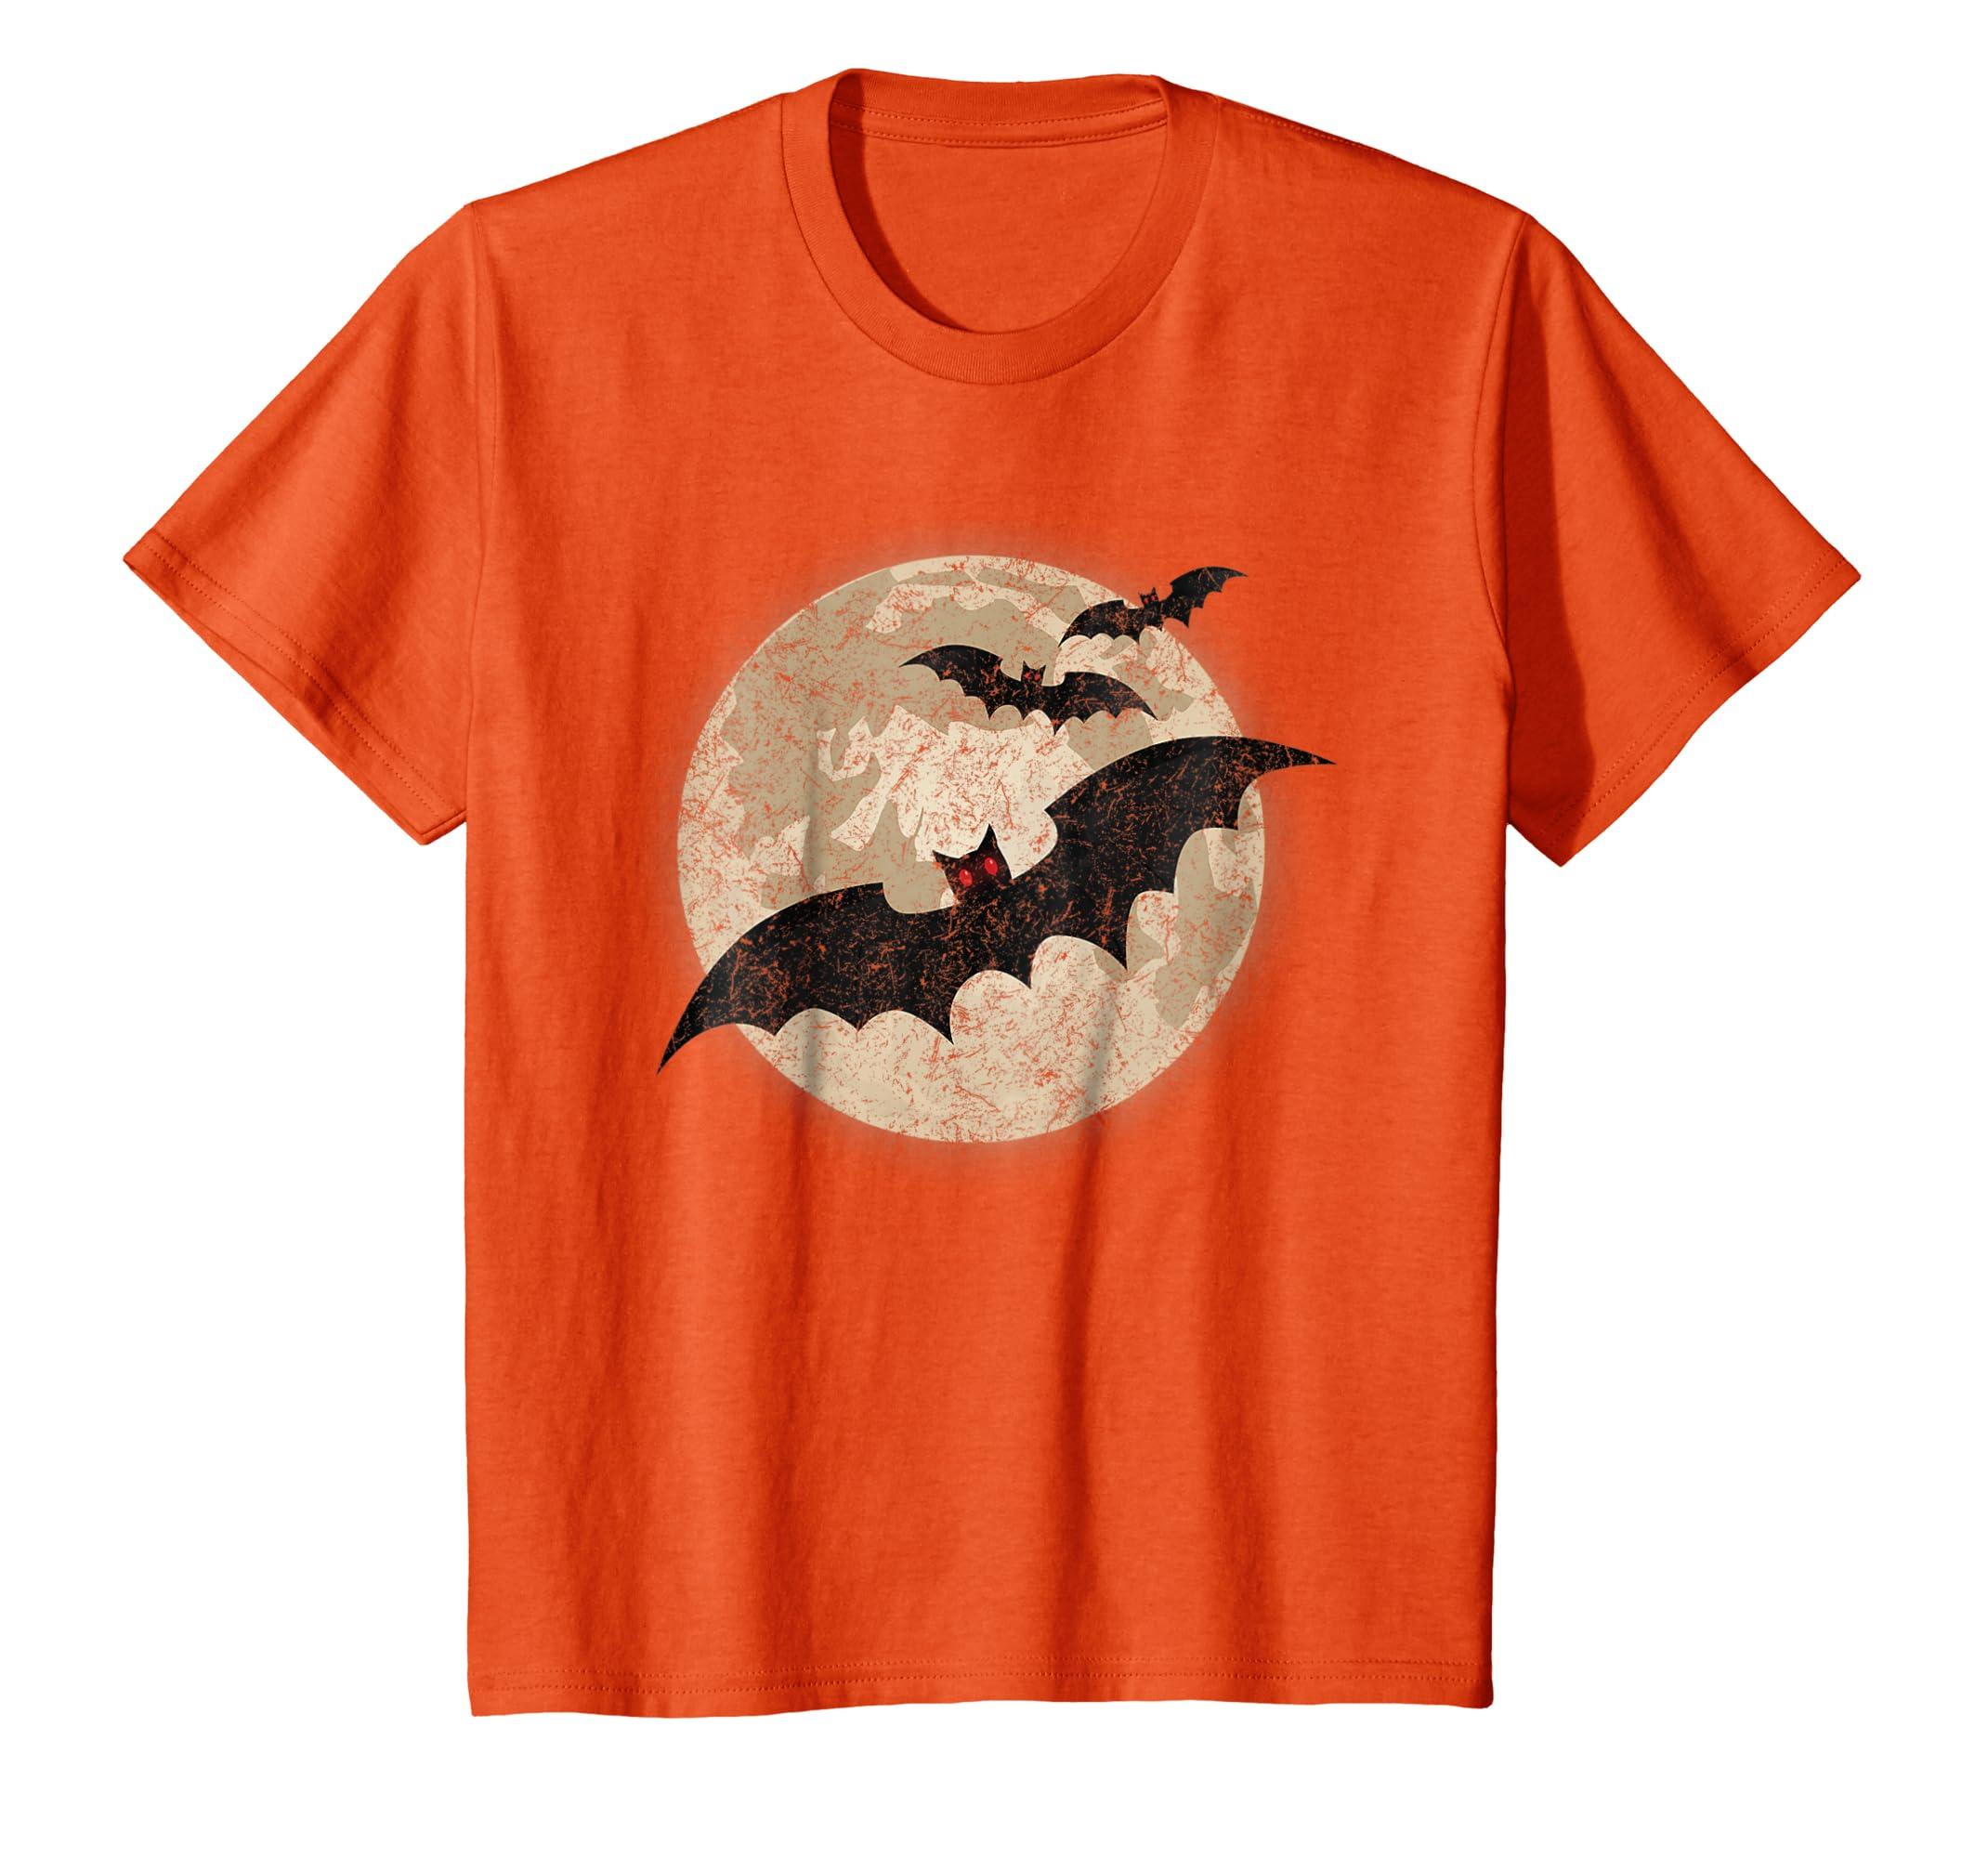 446123d93 Amazon.com: Kids HALLOWEEN SHIRTS FOR KIDS | Toddler Halloween Bat shirts:  Clothing